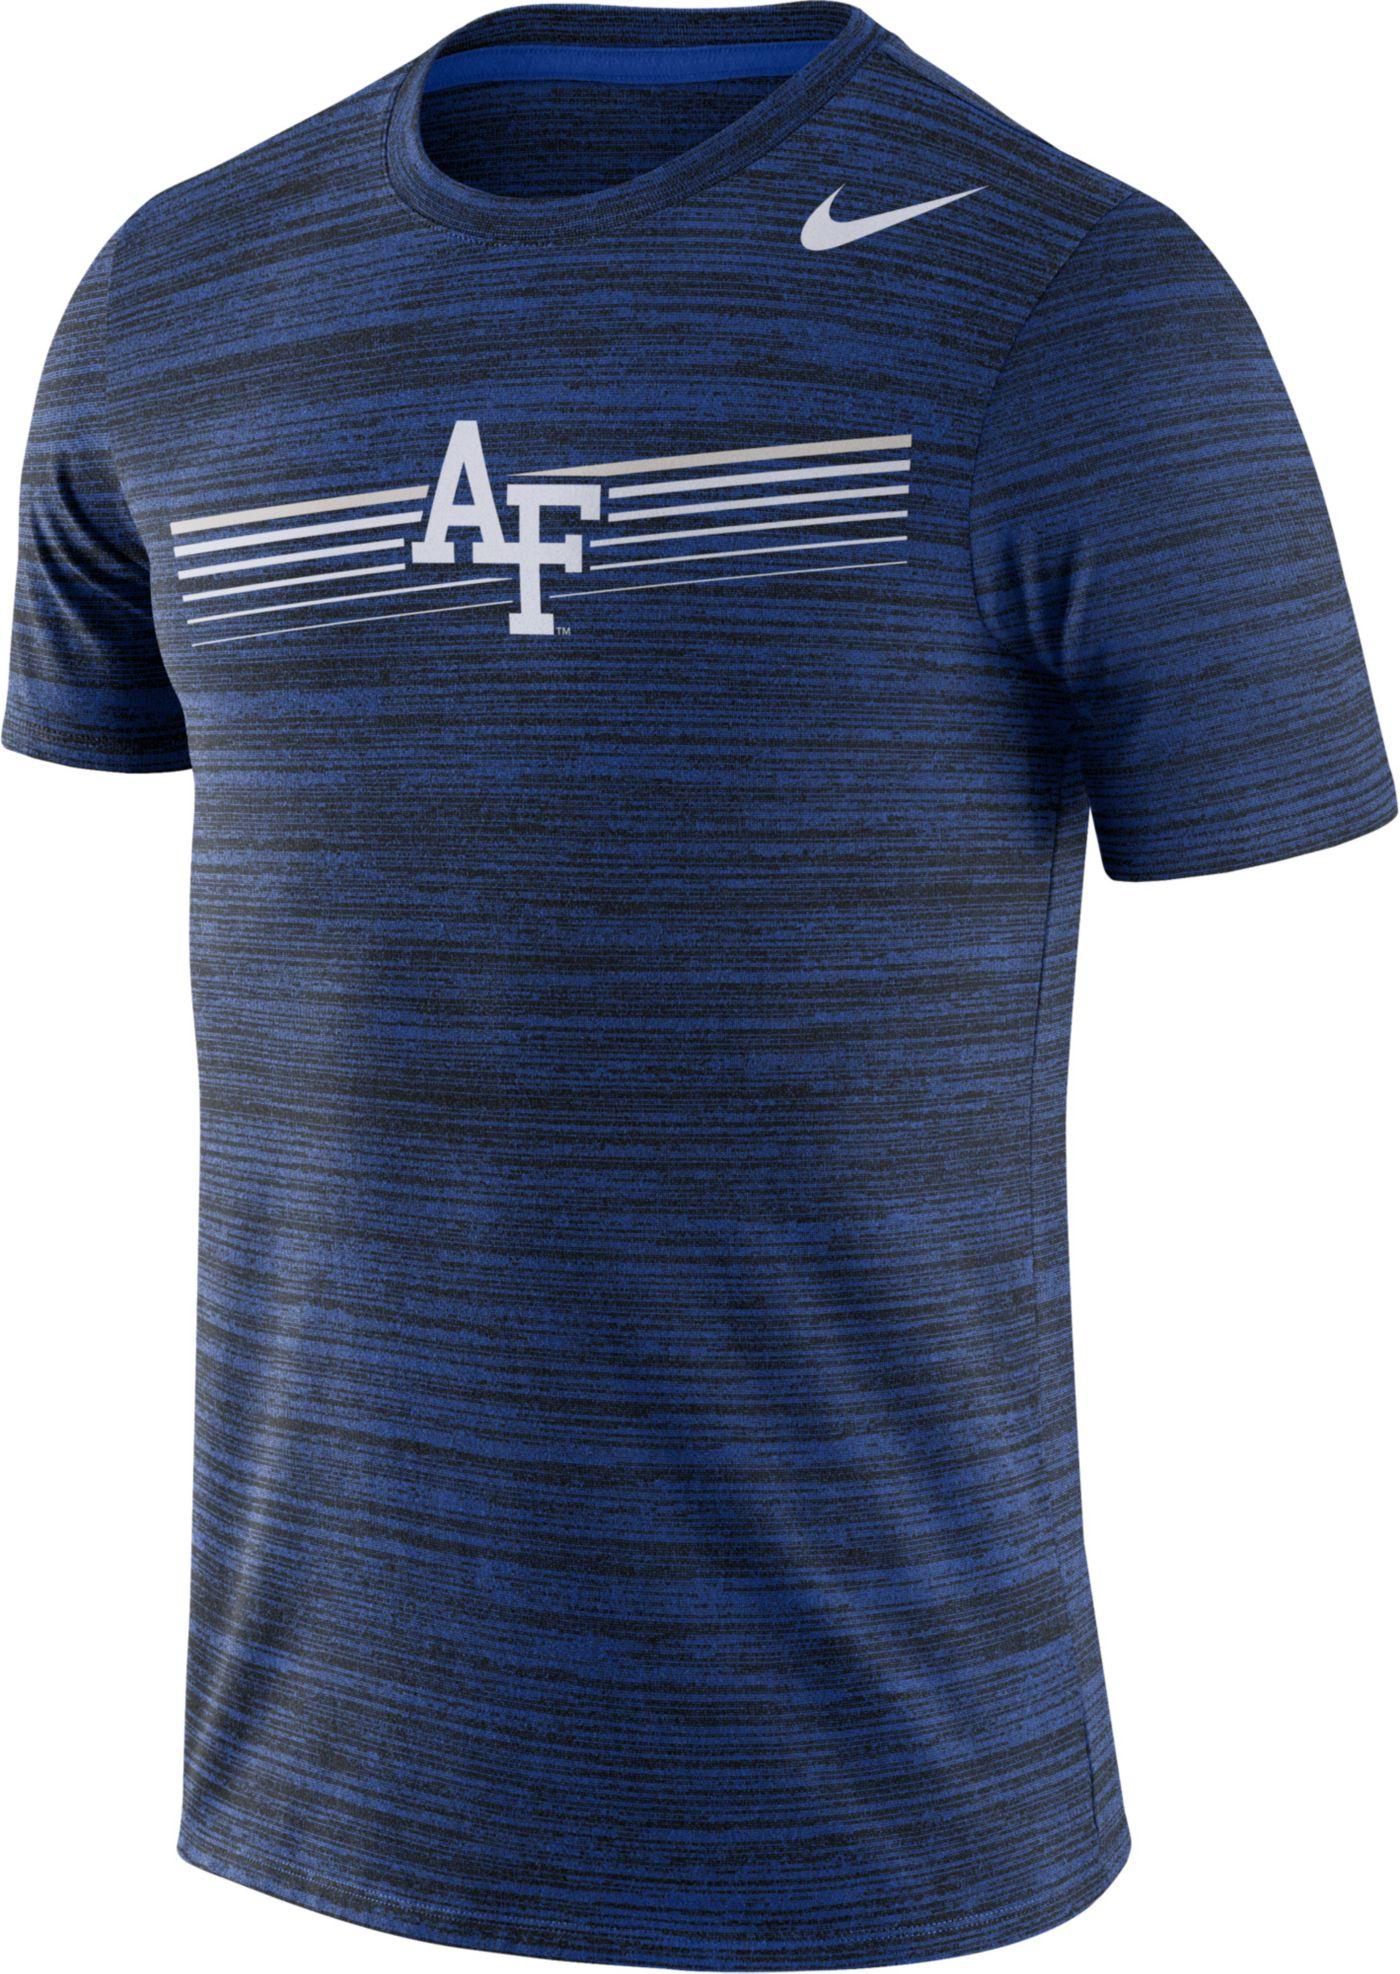 Nike Men's Air Force Falcons Blue Velocity Legend Graphic T-Shirt